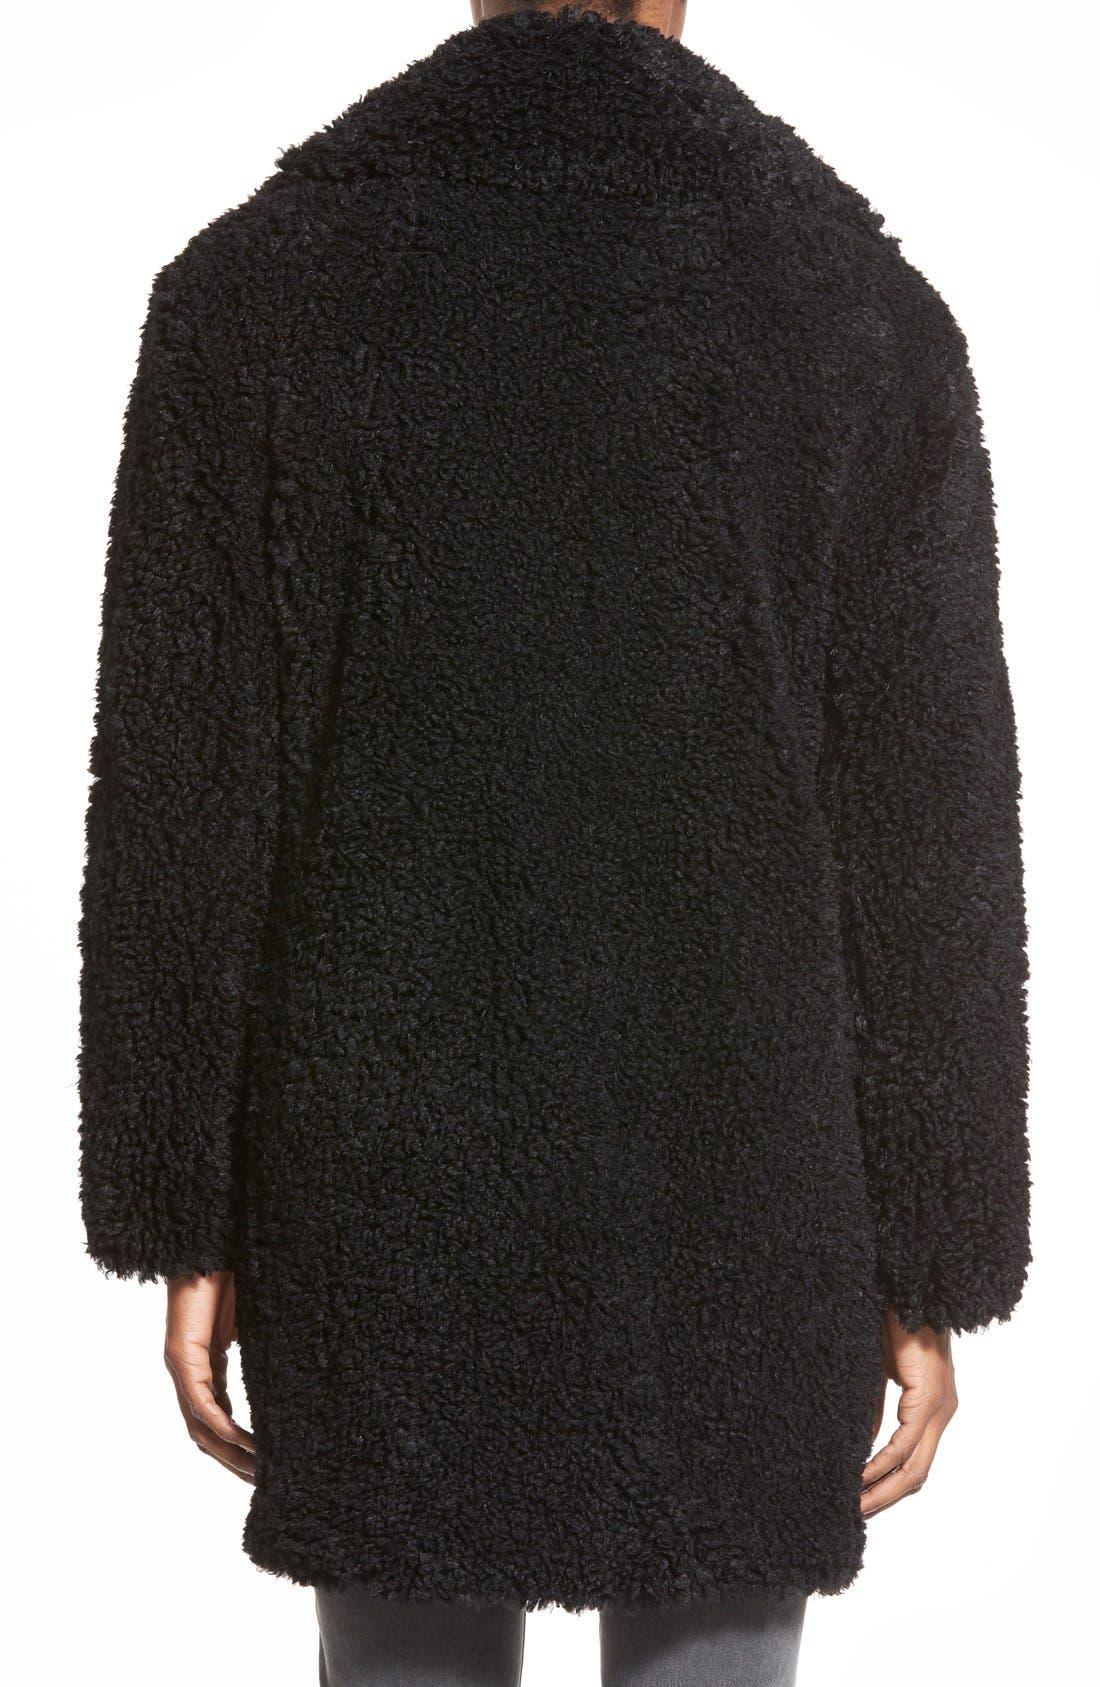 Alternate Image 2  - kensie 'Teddy Bear' Notch Collar Faux Fur Coat (Online Only)